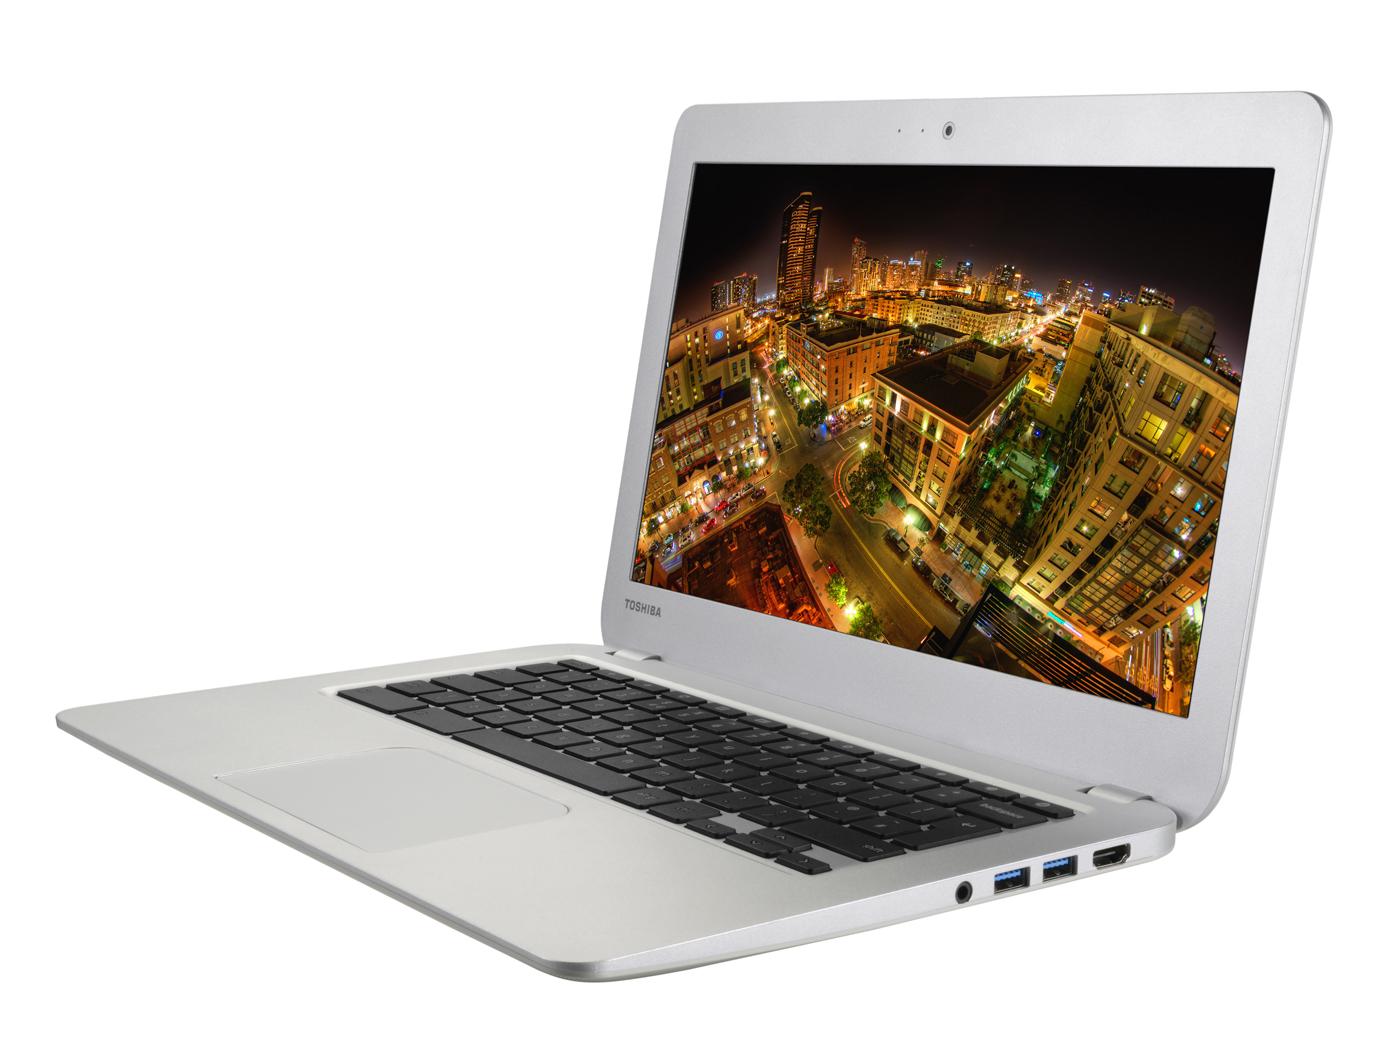 Toshiba chromebook 2 review uk dating 4